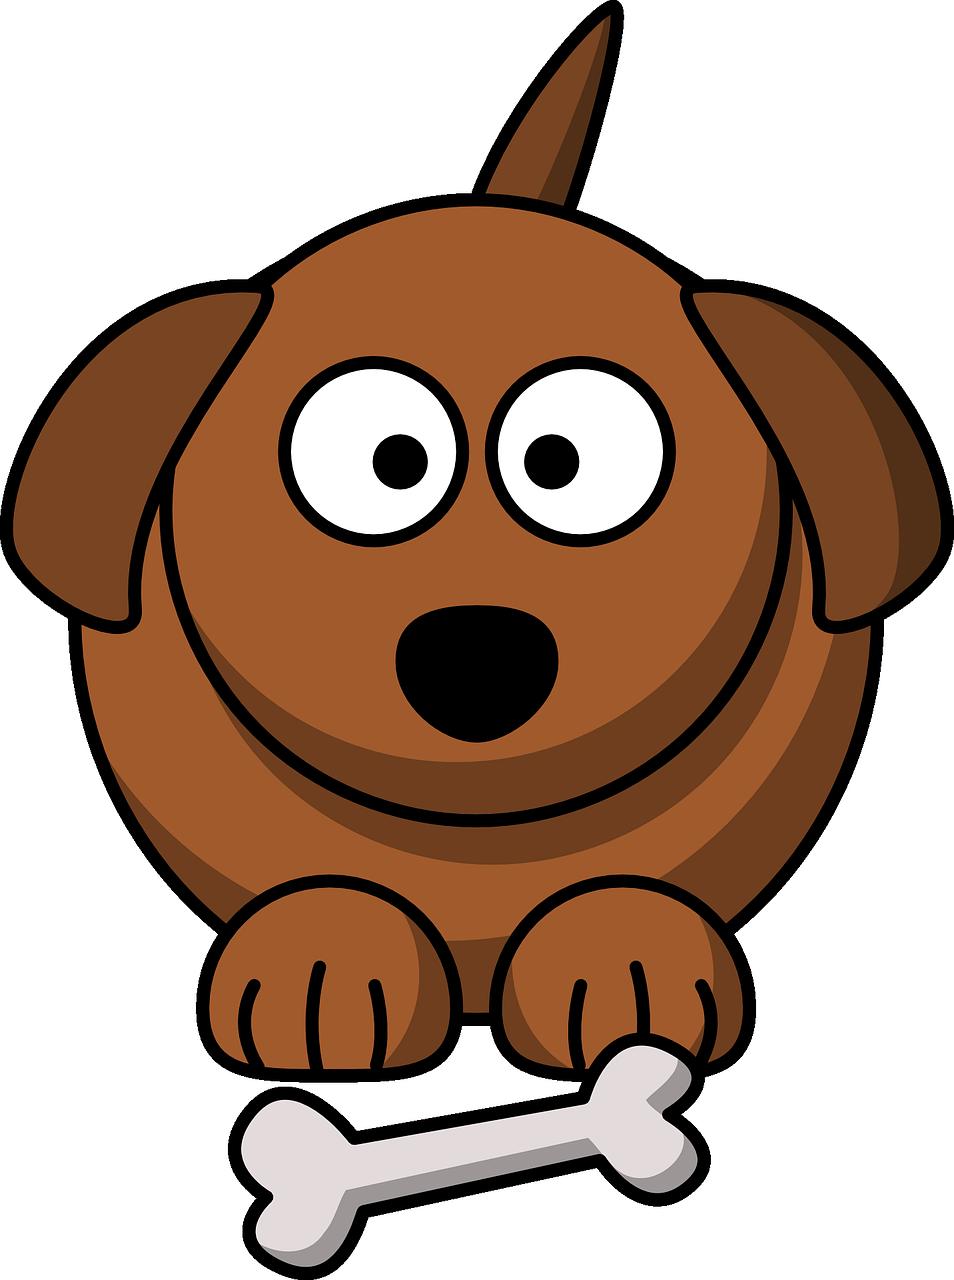 Hunde logo